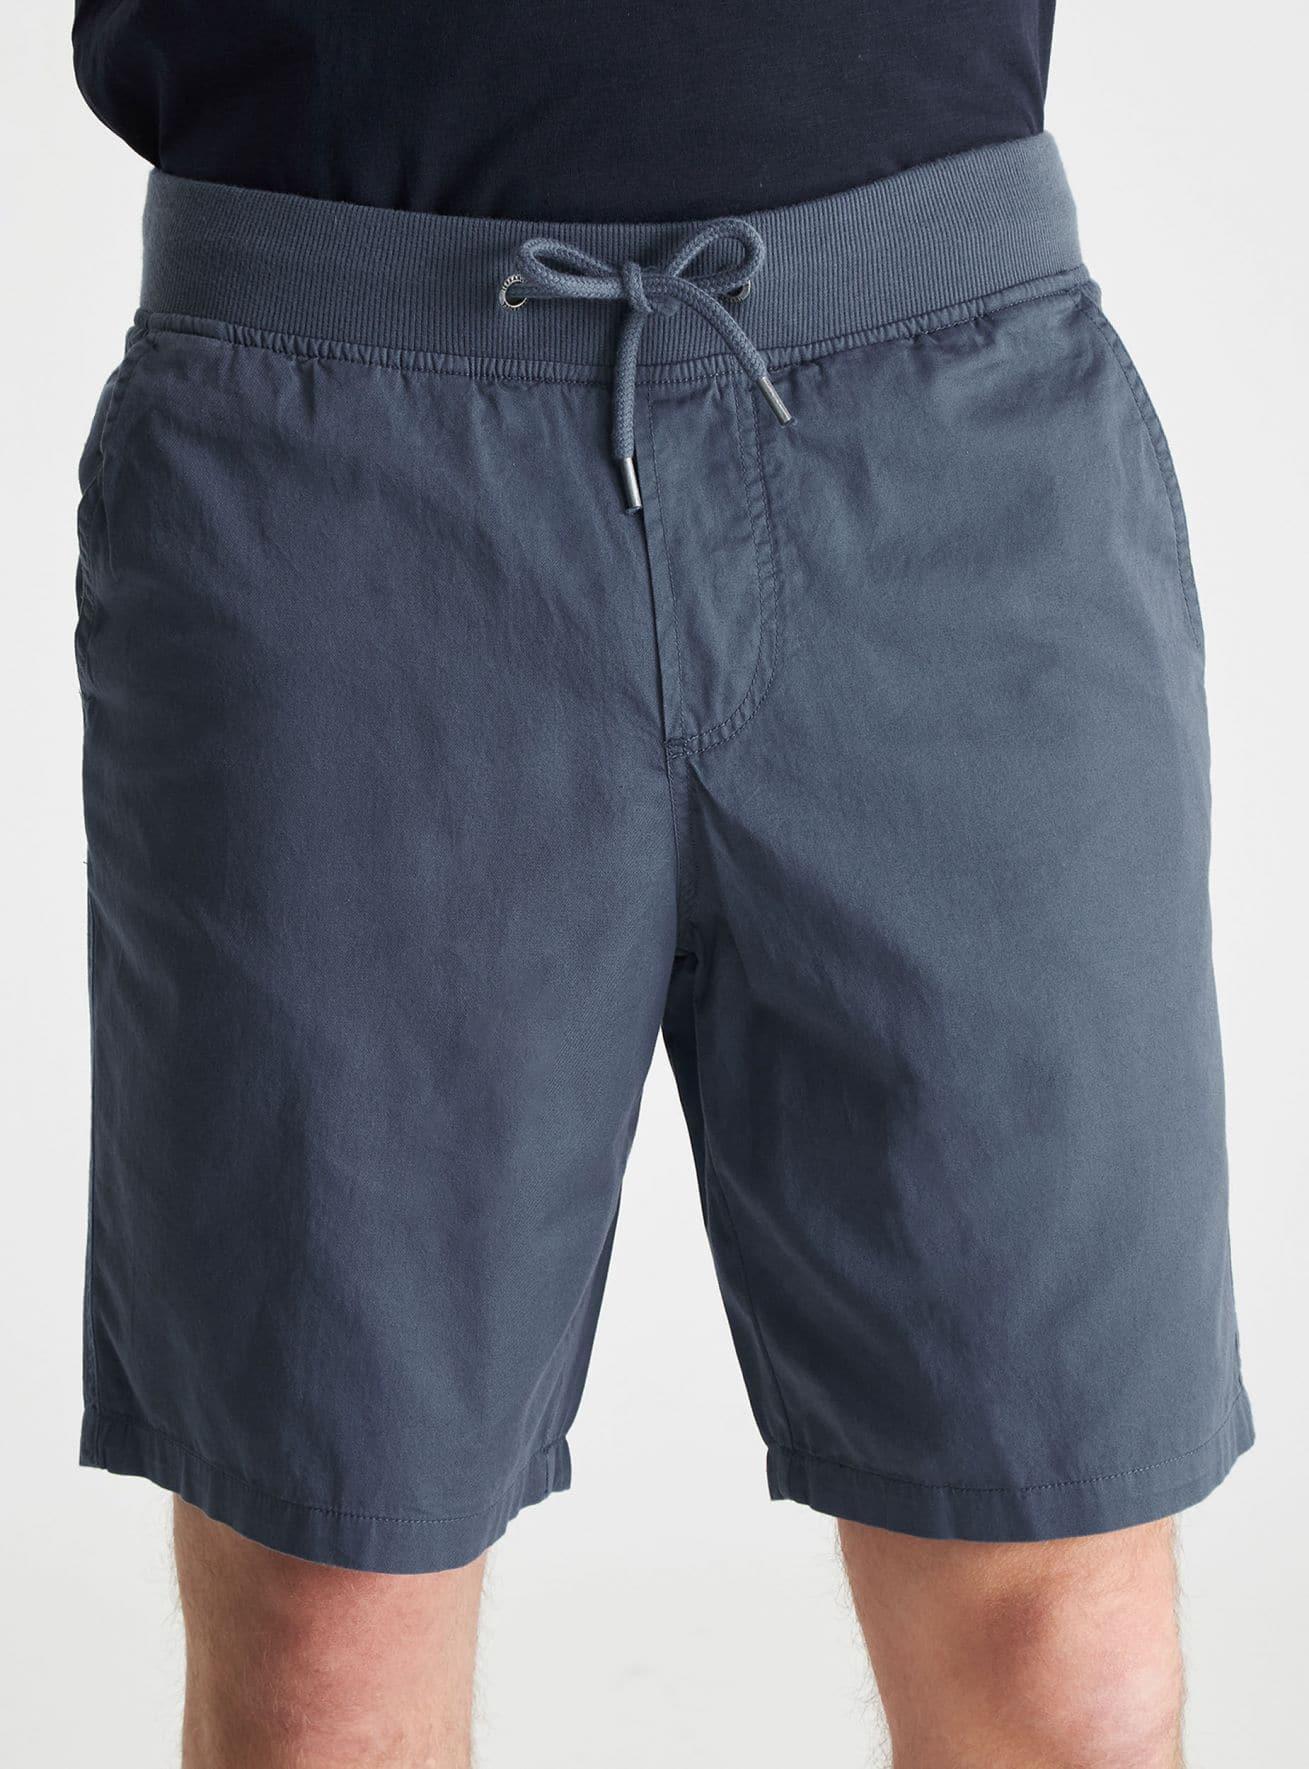 Pantalone Corto Hombre Terranova